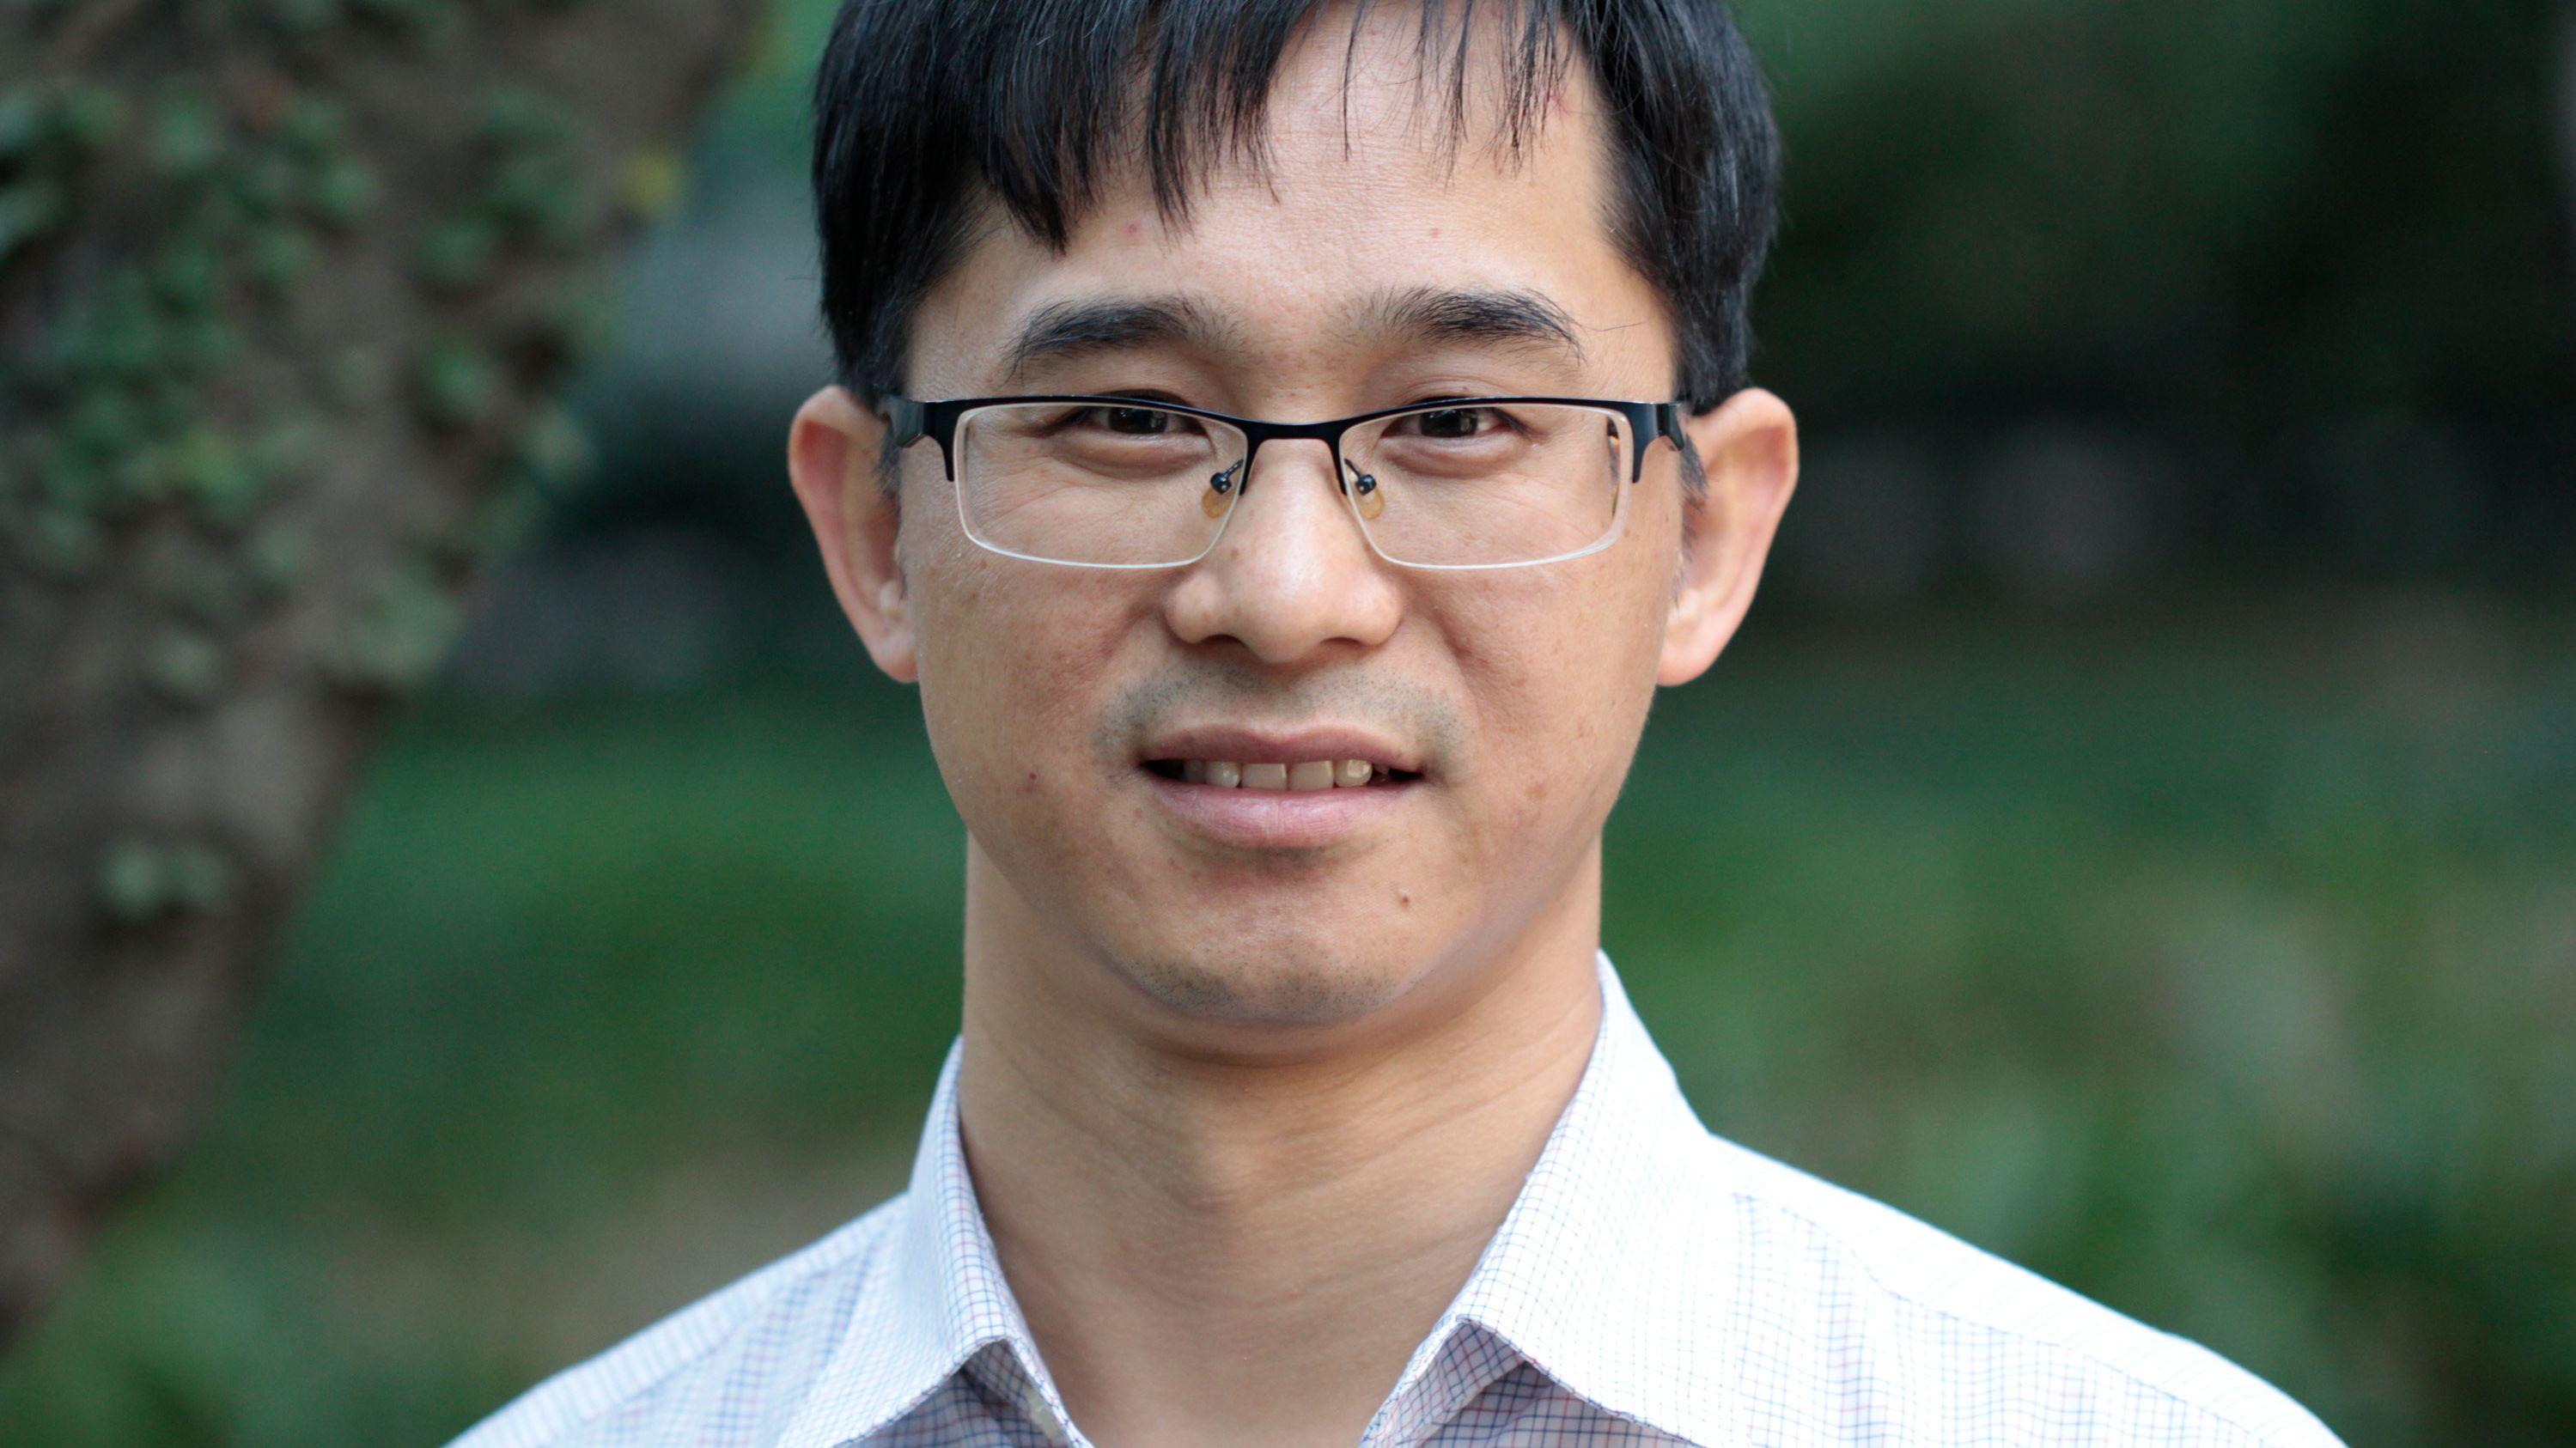 CRISPRベビー誕生前夜 世界で初めてヒト胚の 遺伝子編集をした男